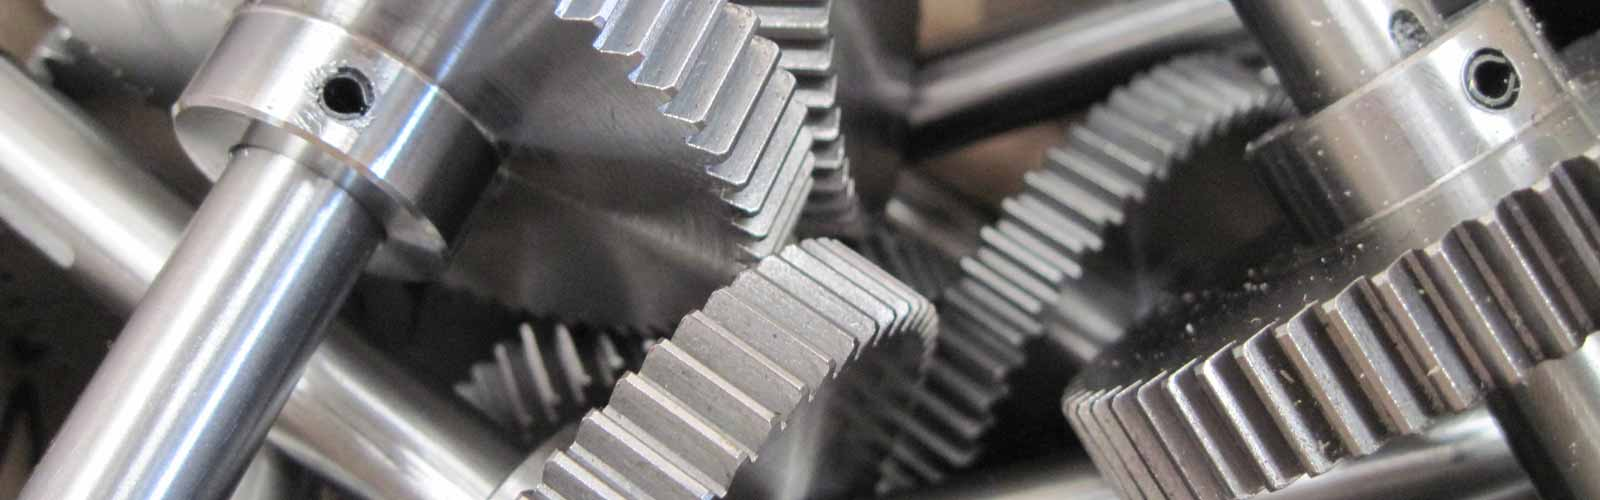 Gear cutting, yorkshire, allan-Green-Acetarc-gear-cutting-group-spur-gear